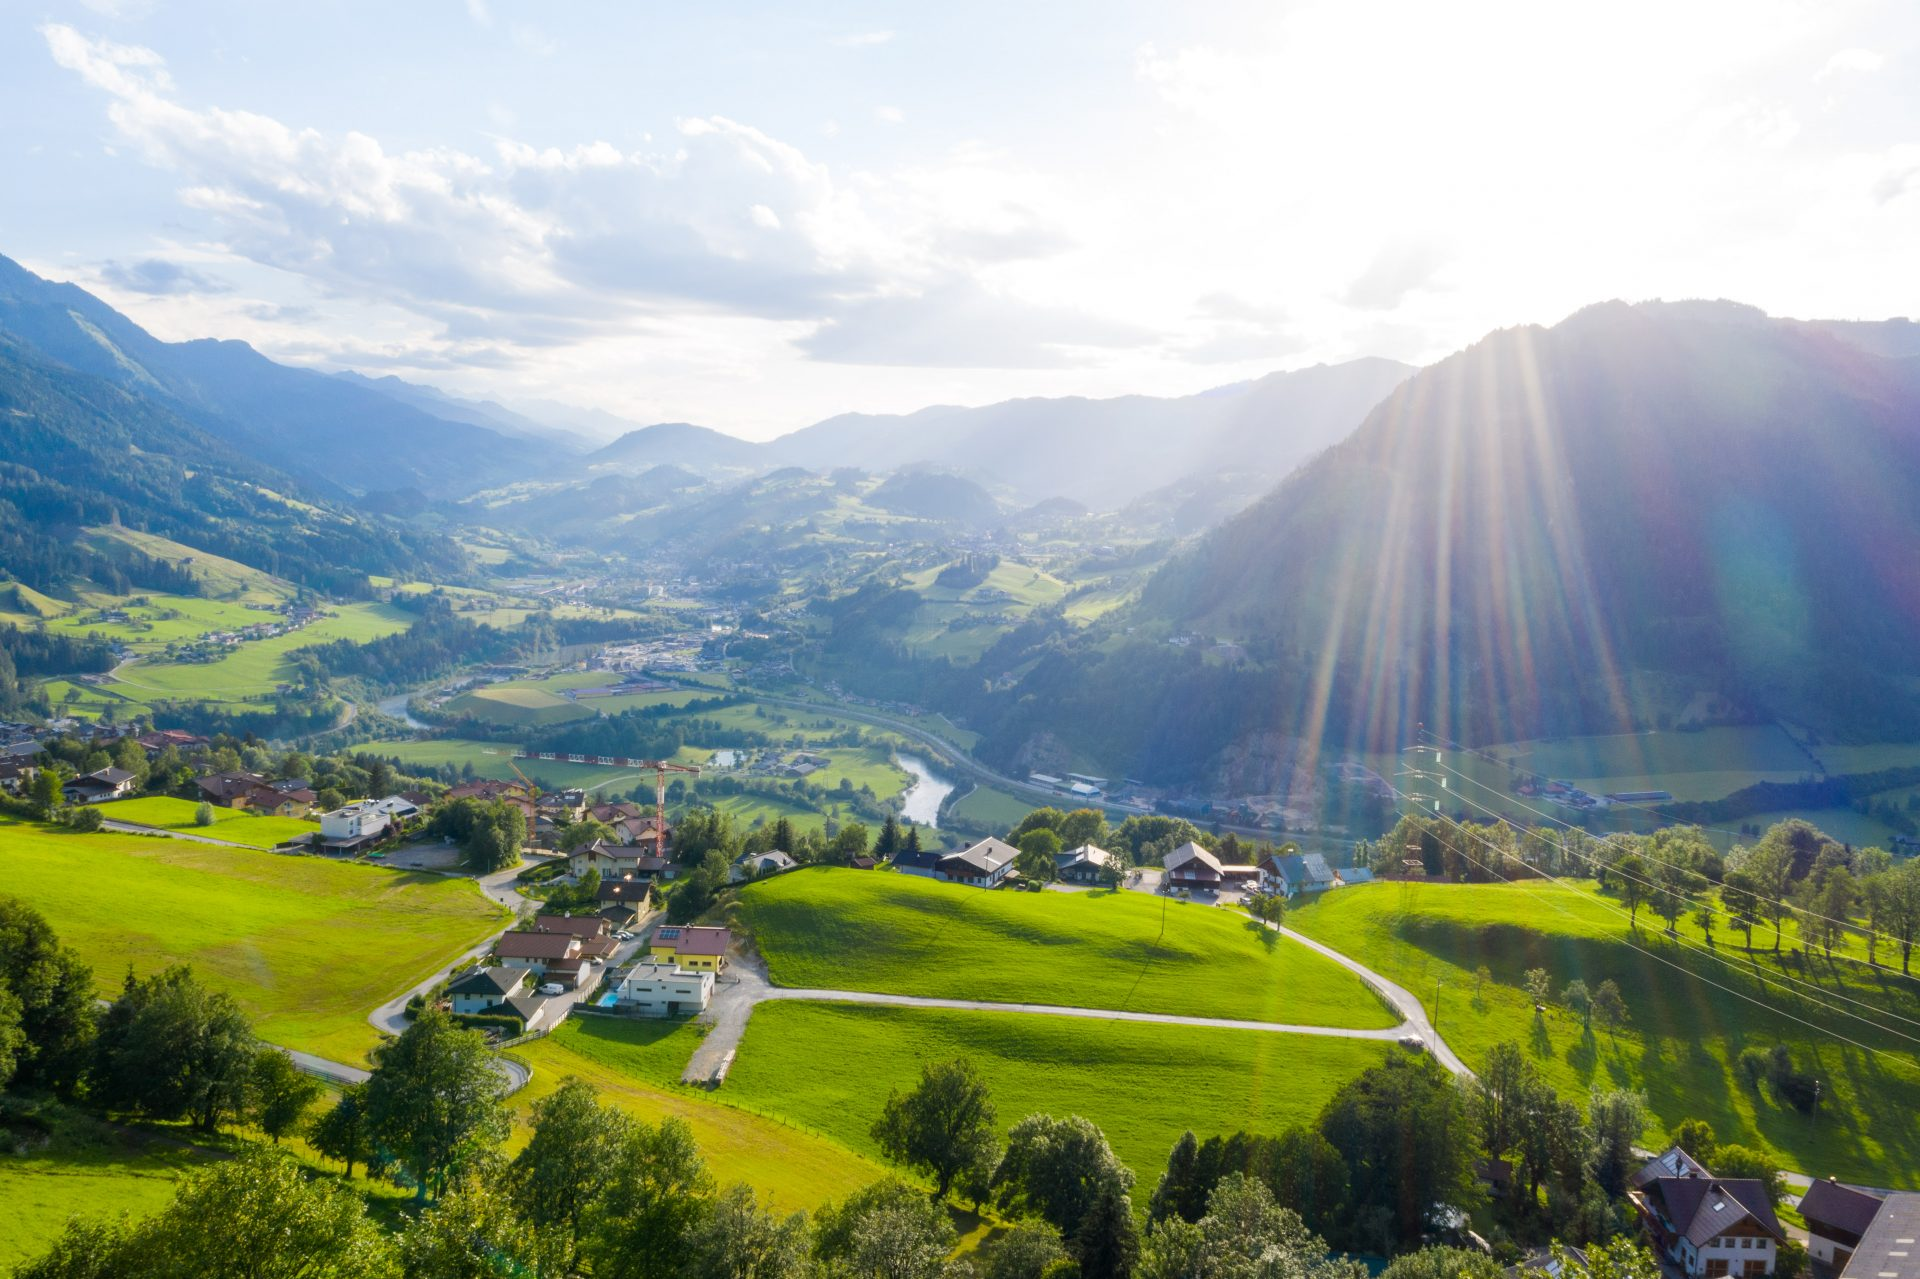 Blaupause_Alpendorf_Drohne_Juli2020_Ueberblick